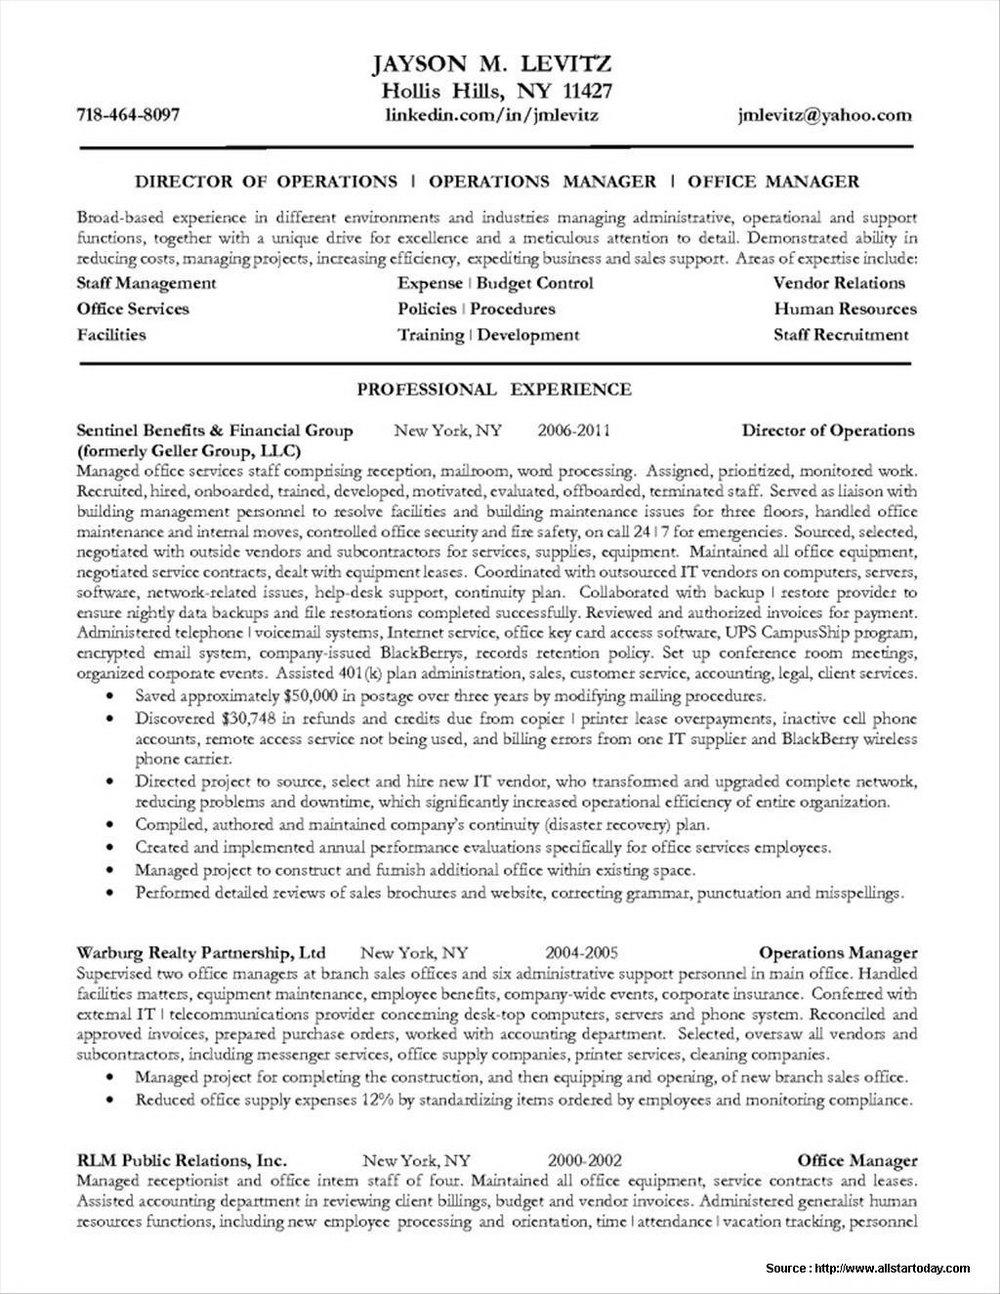 Best Resume Writing Service Atlanta